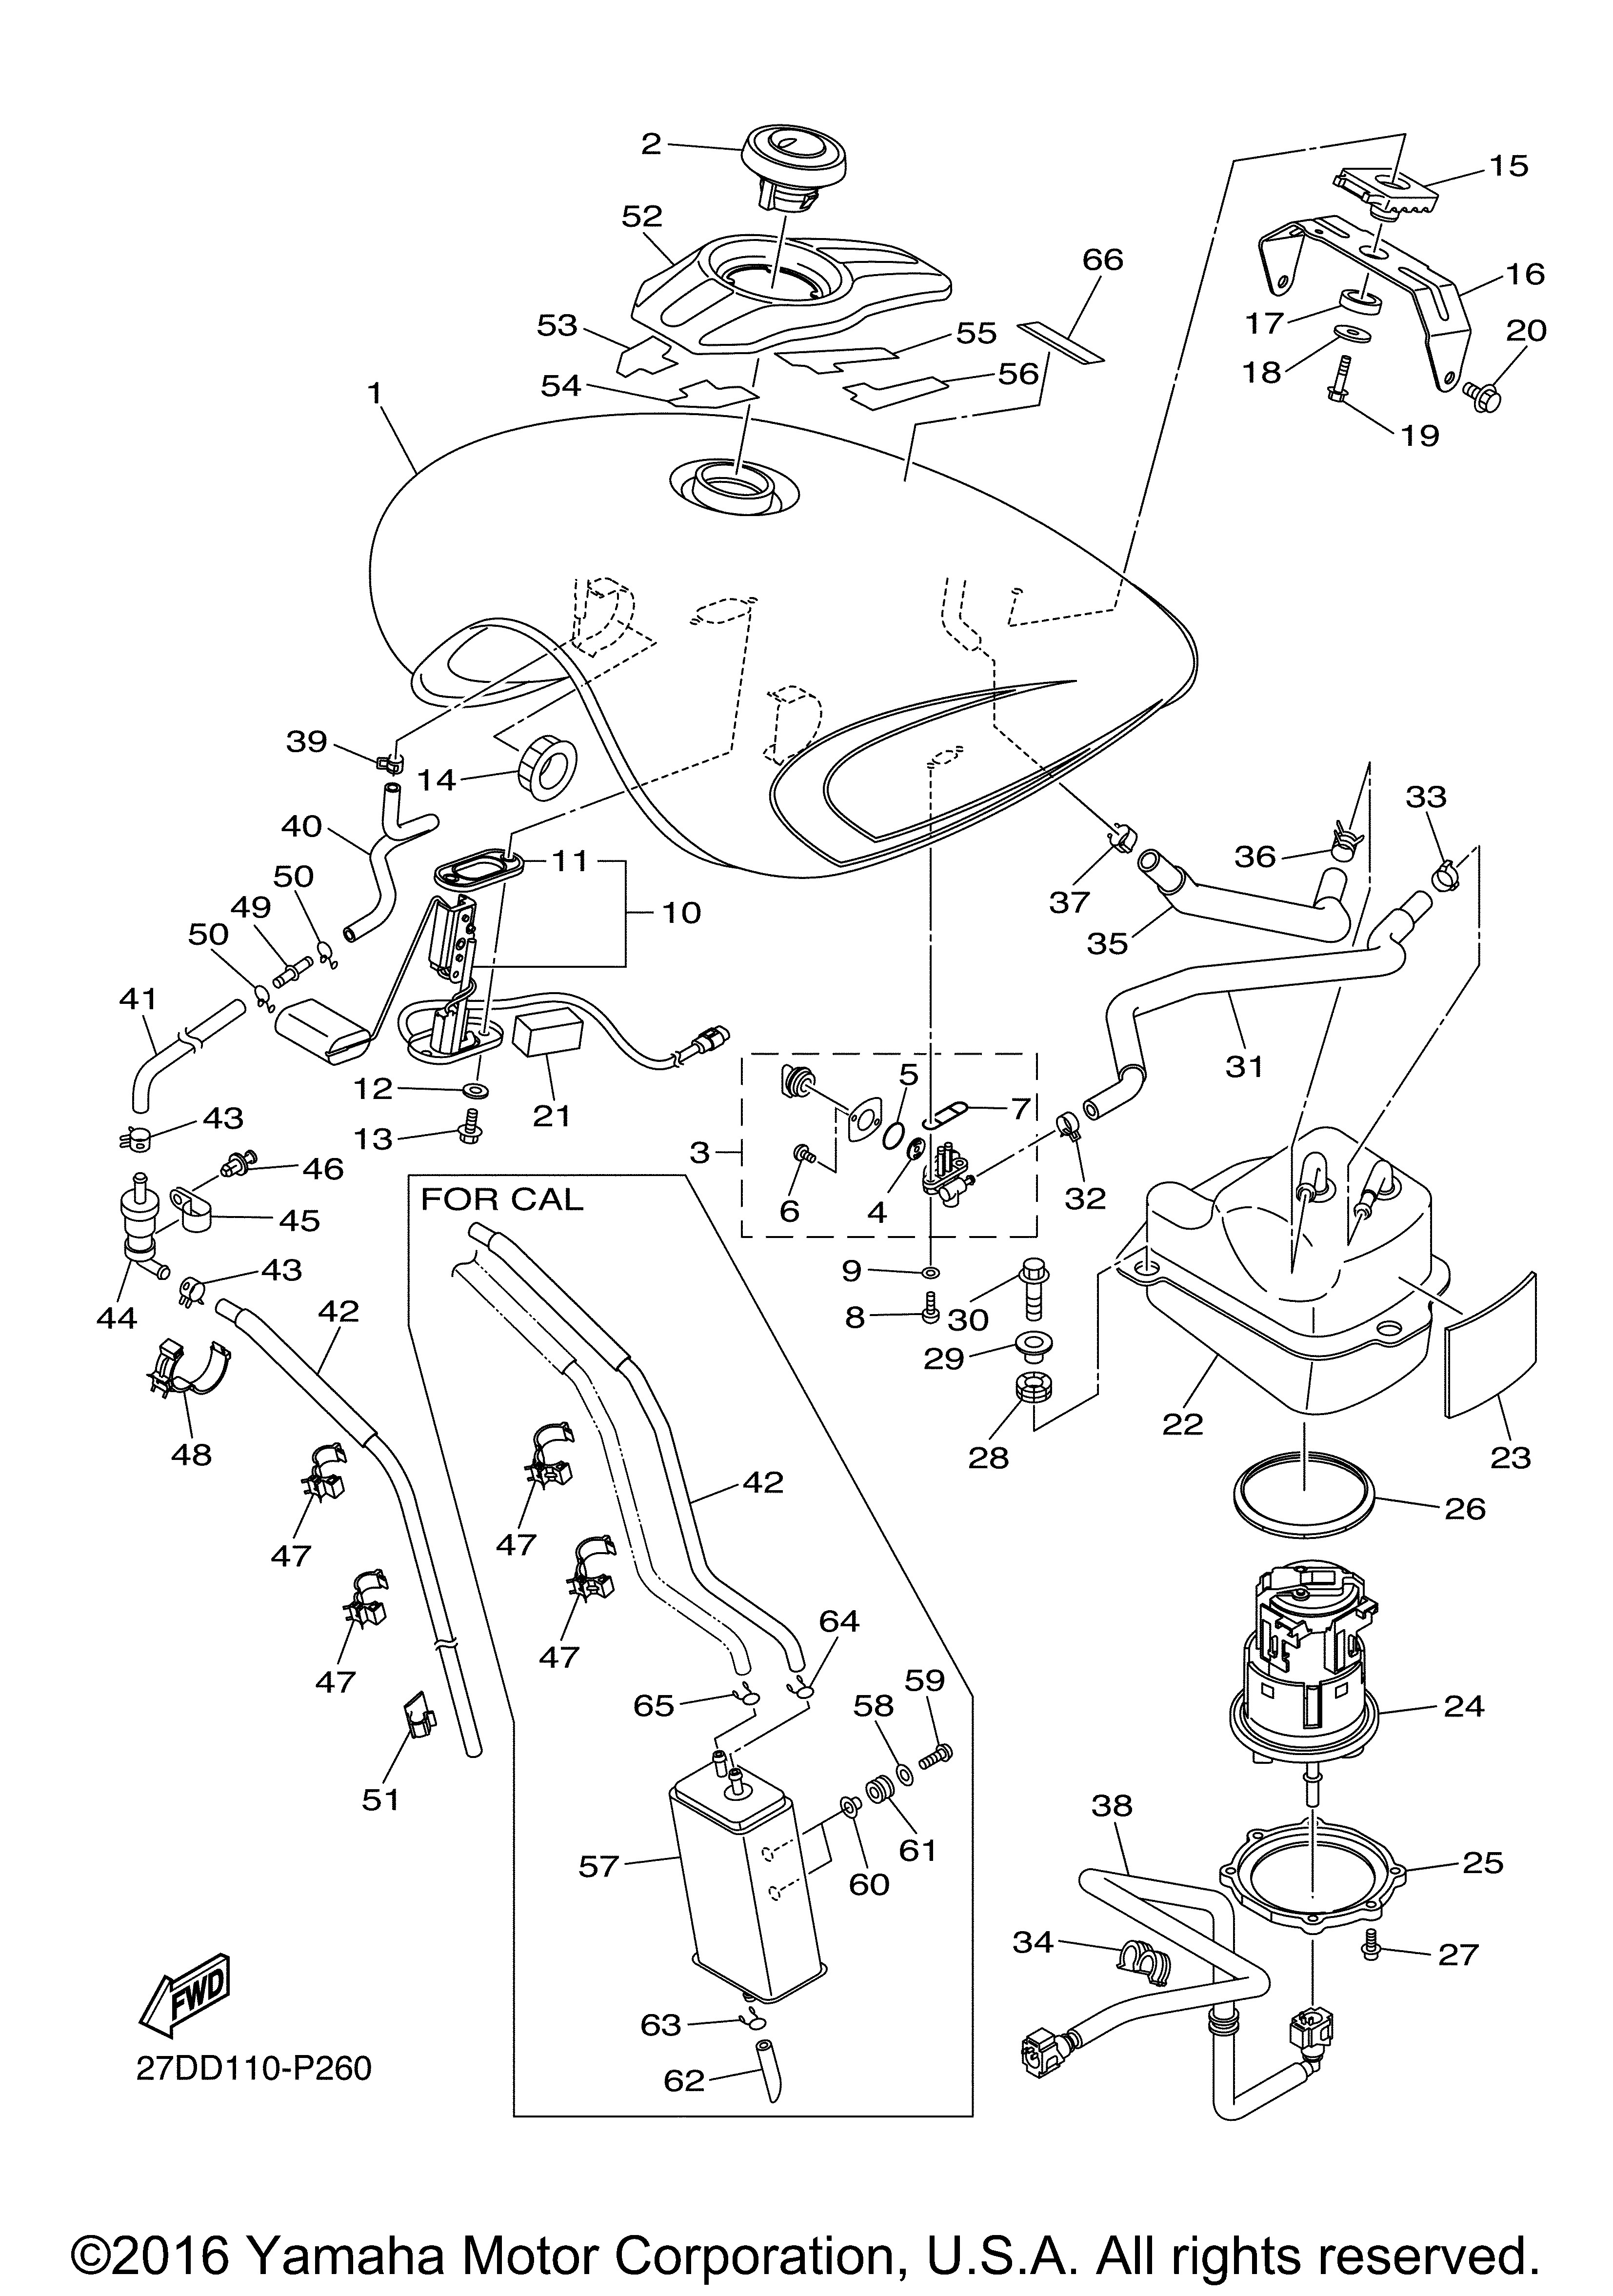 Yamaha 3D8-13907-01-00 Fuel Pump Complete; 3D8139070100 Made by Yamaha